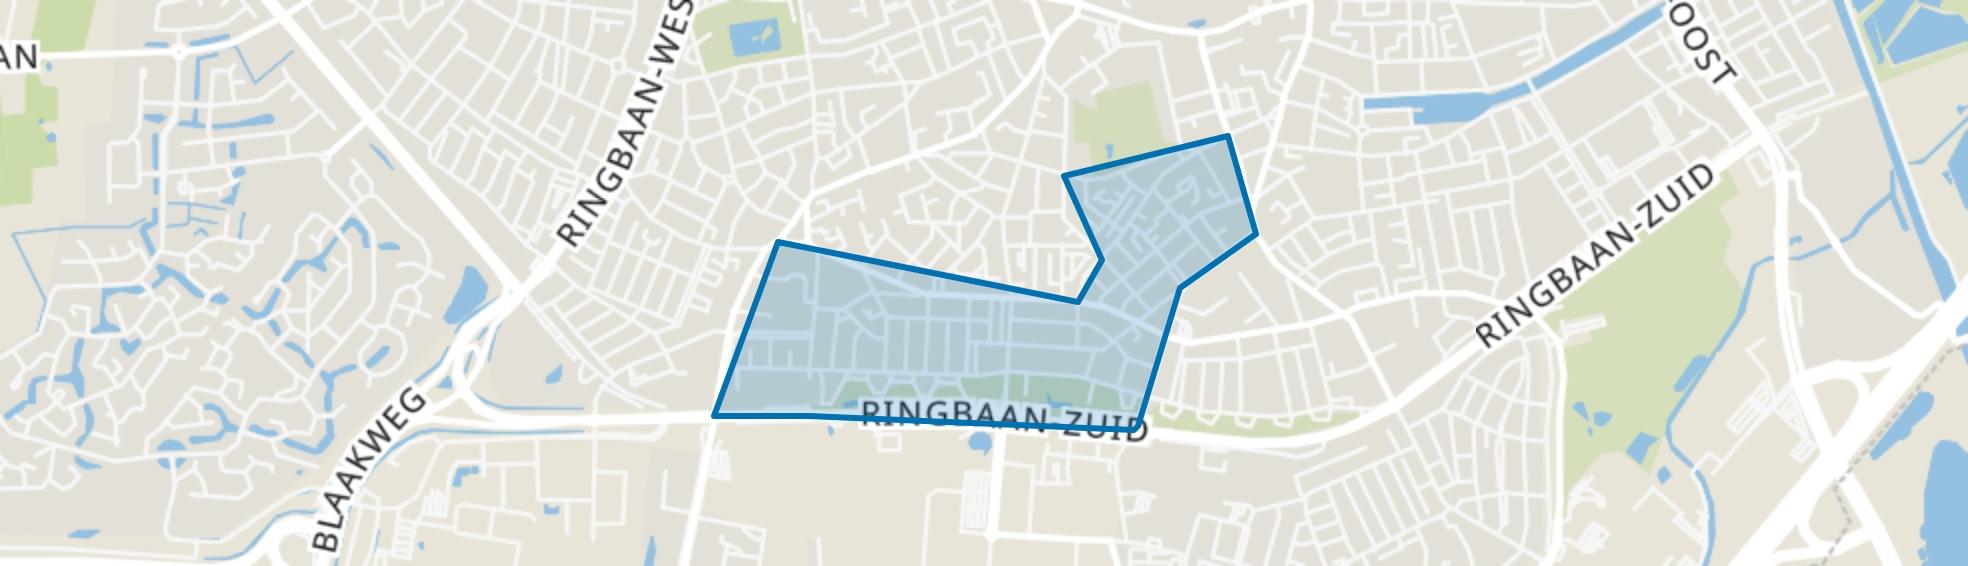 Oerle, Tilburg map